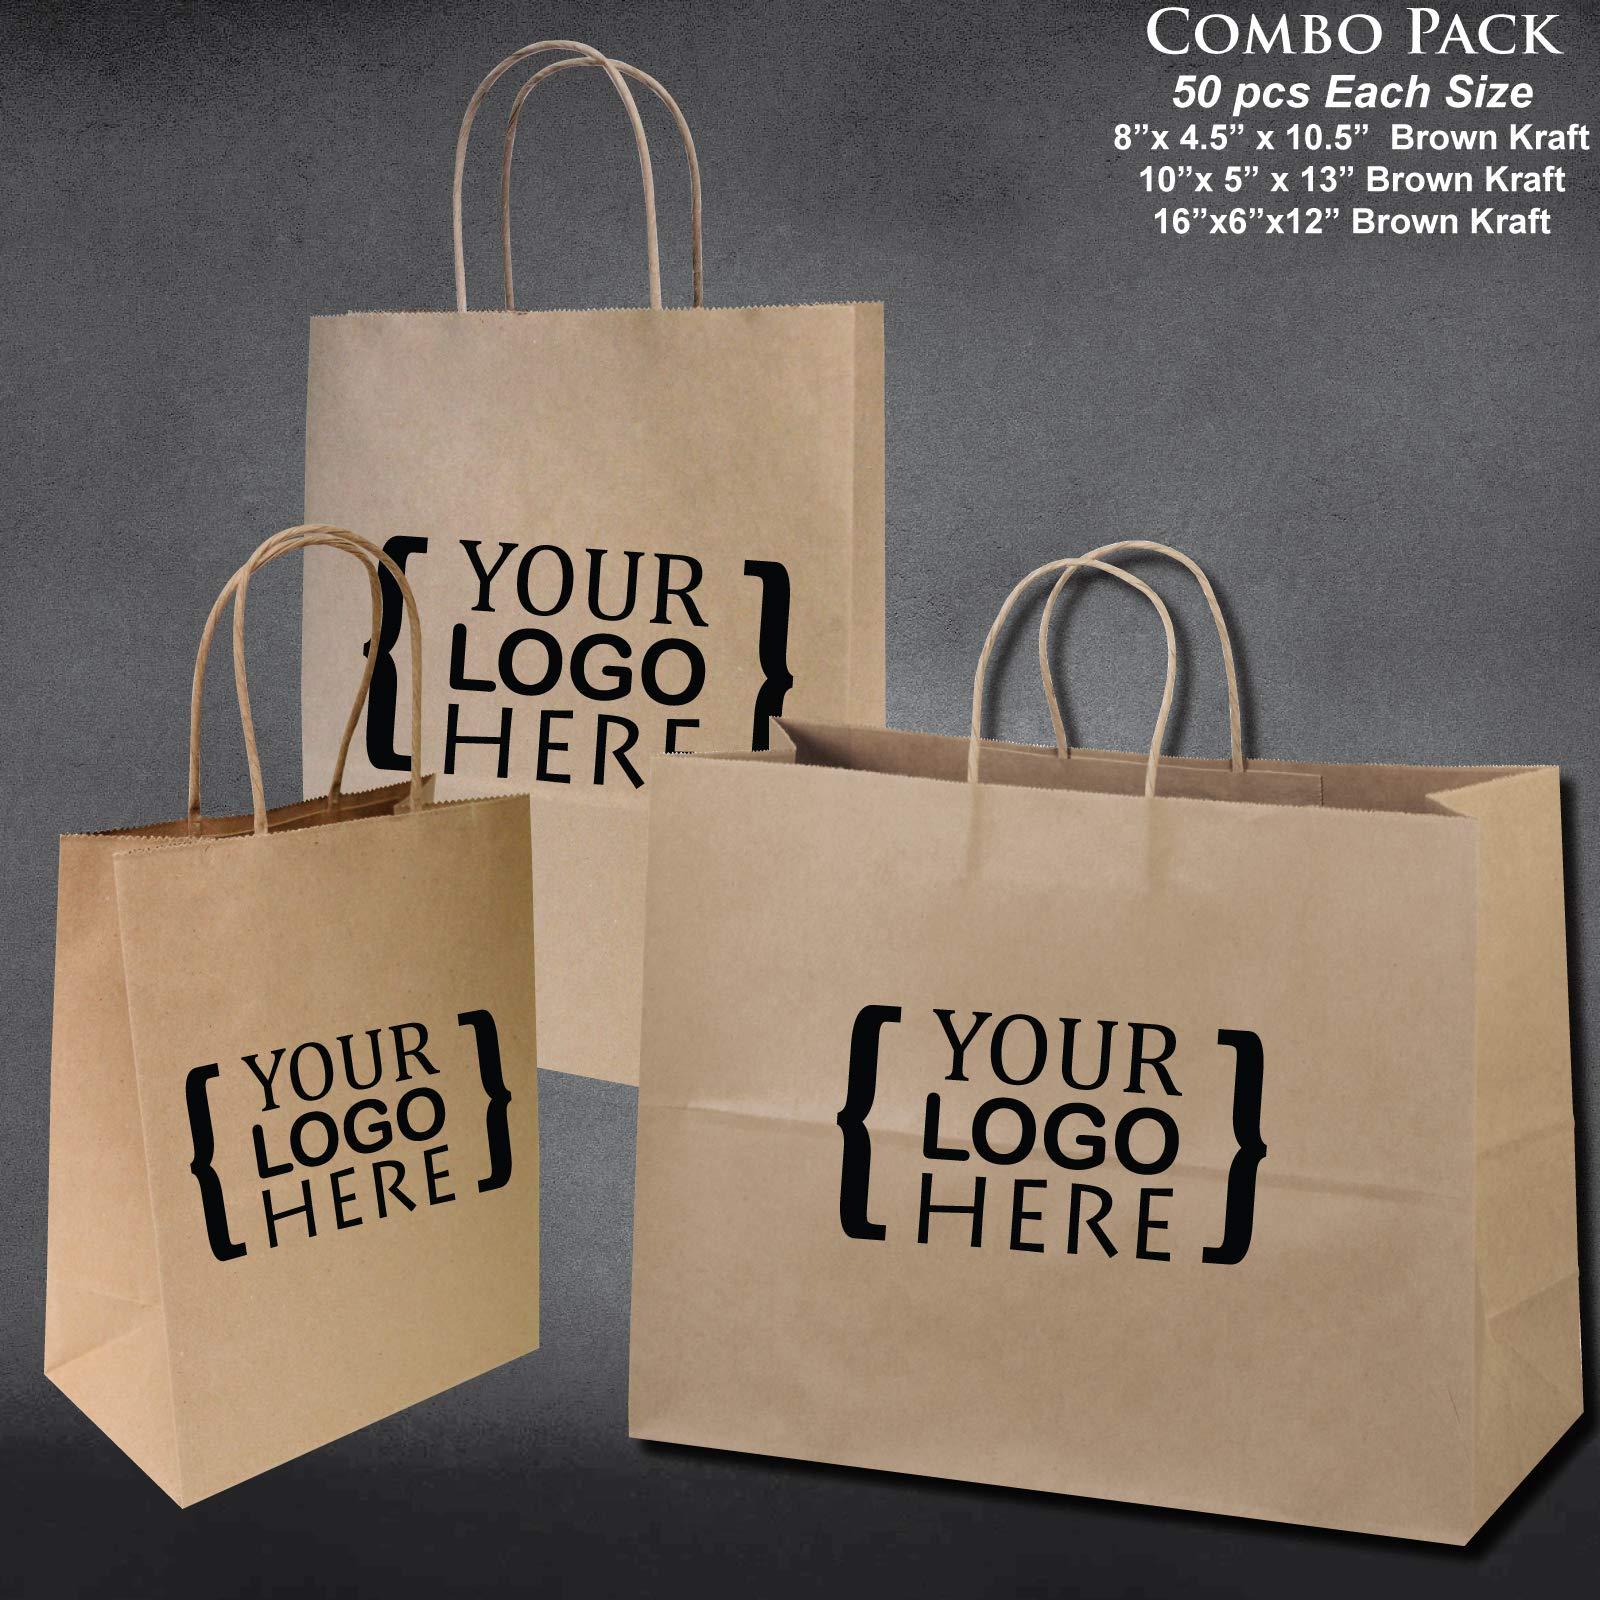 8''x4.75''x10''-10''x5''x13''-16''x6''x12'' - 50 Pcs Each - Custom Printed Bagsource Brown Kraft Paper Bags 95% Post Consumer Materials & FSC Certified … (Custom Printed)